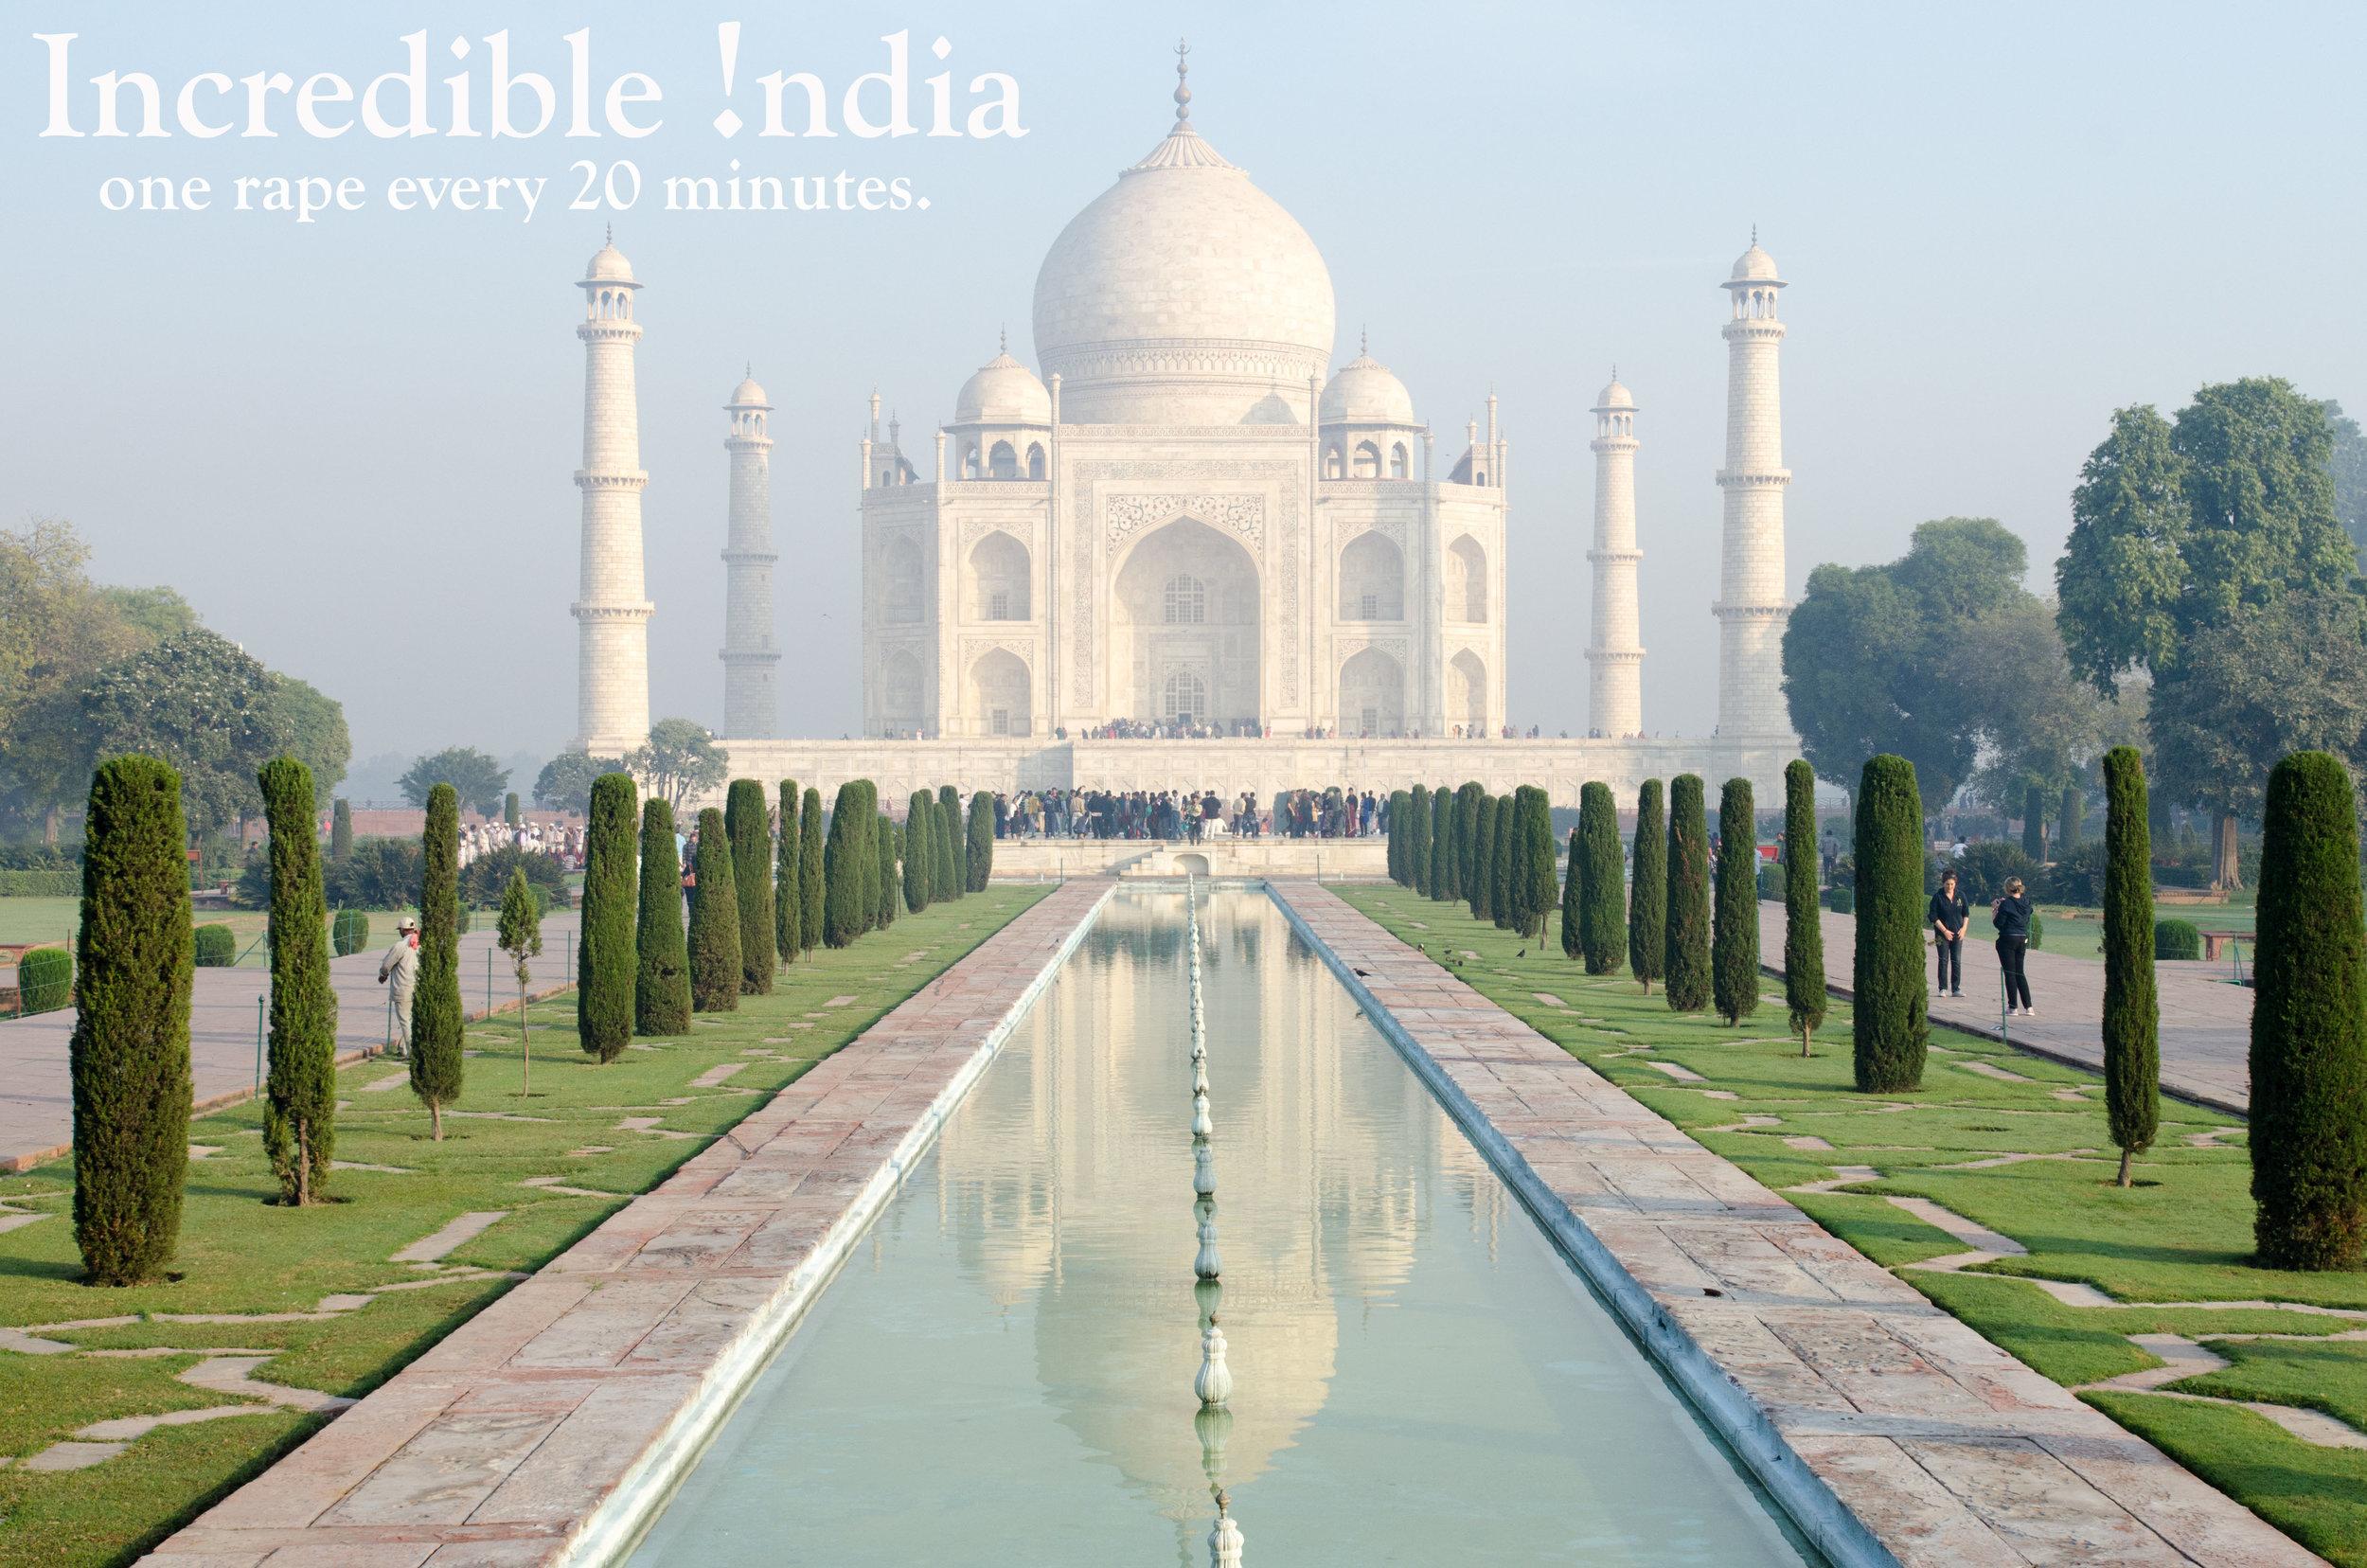 Incredible India1.jpg